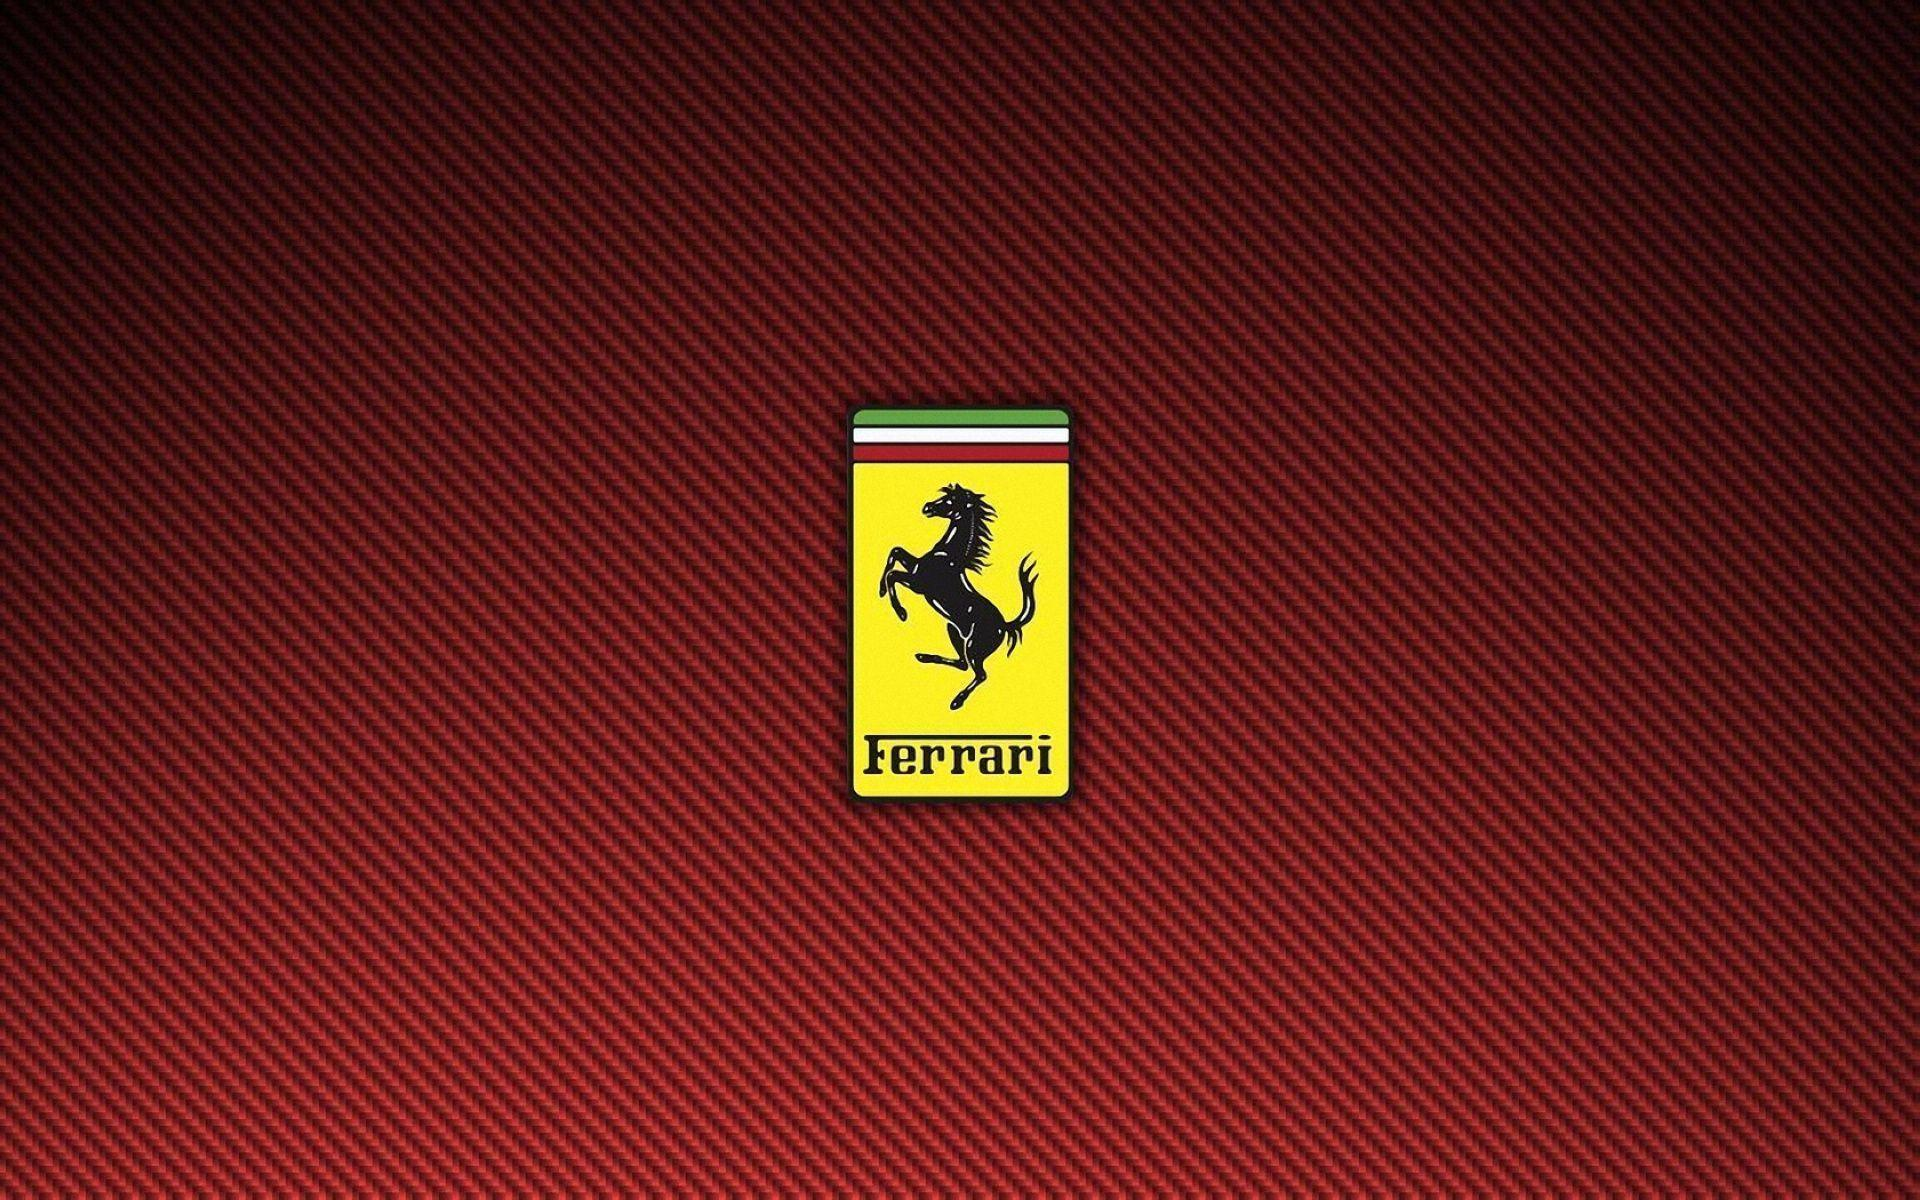 Ferrari Logo Wallpapers - Full HD wallpaper search